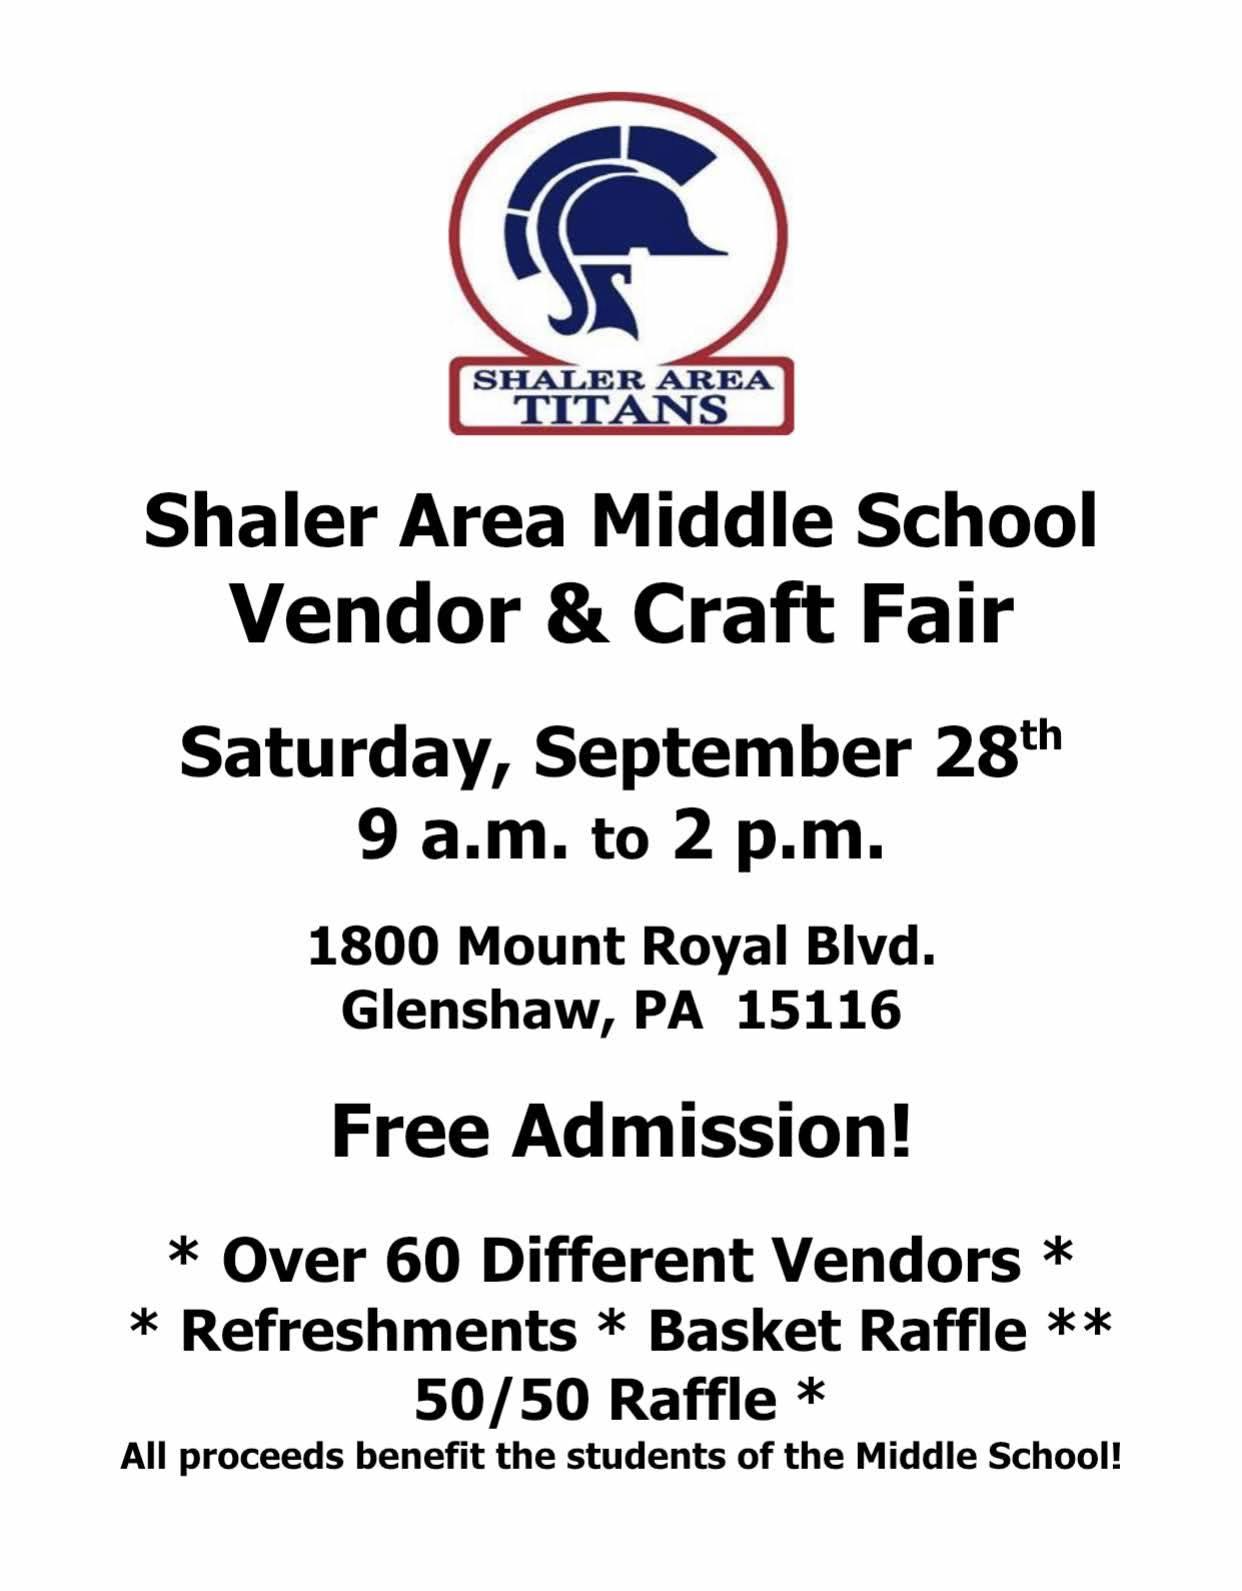 Shaler Area Middle School 12th Annual Vendor & Craft Fair